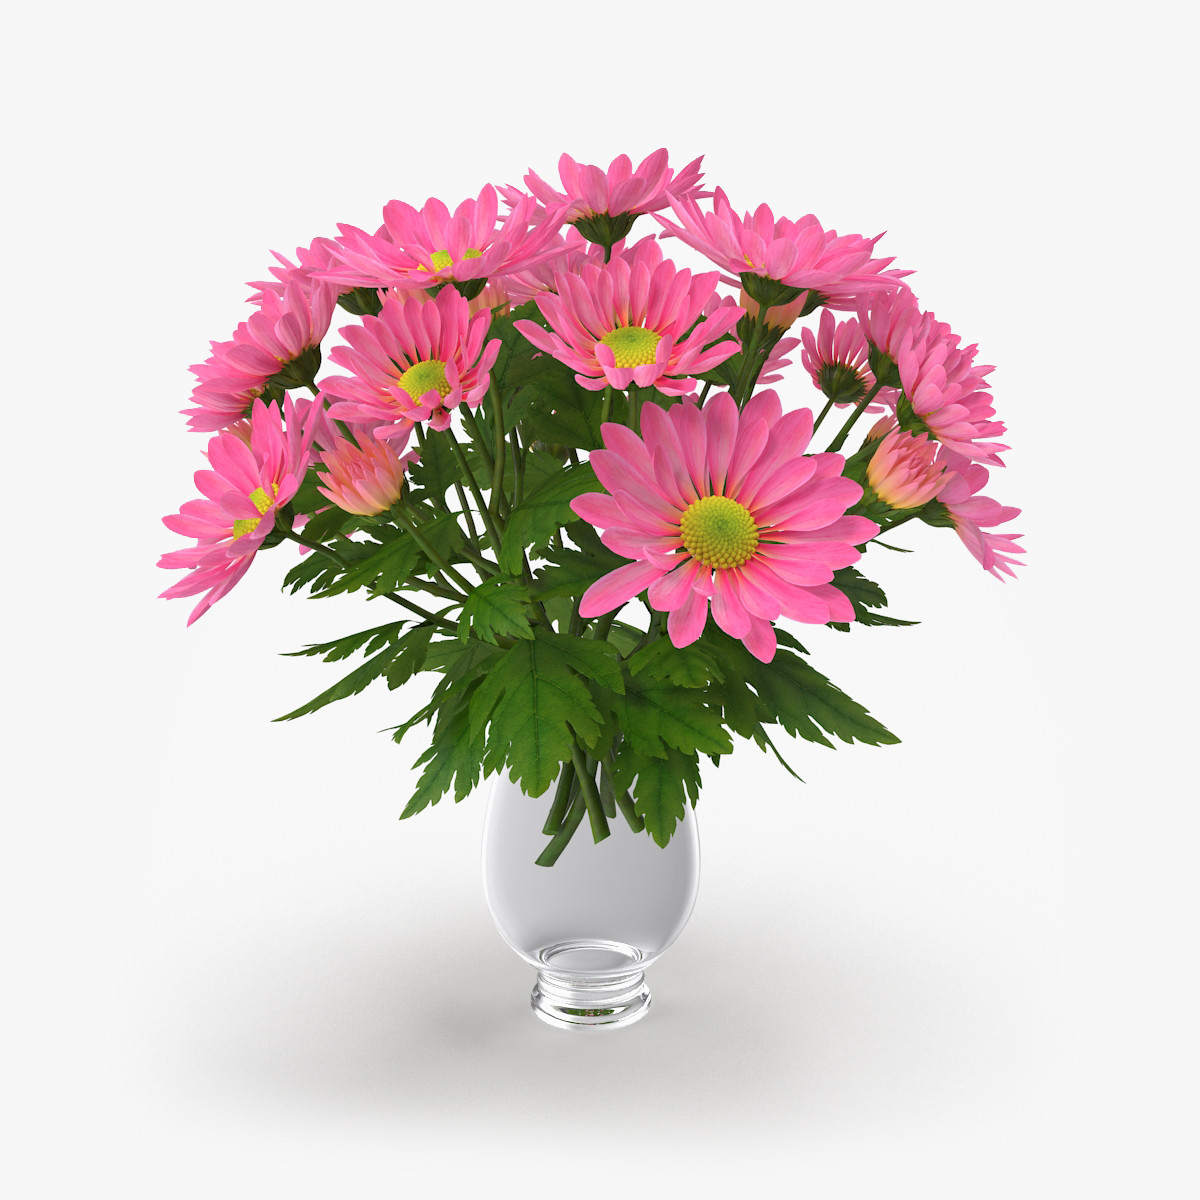 chrysanthemum_vase2_1_2.jpg